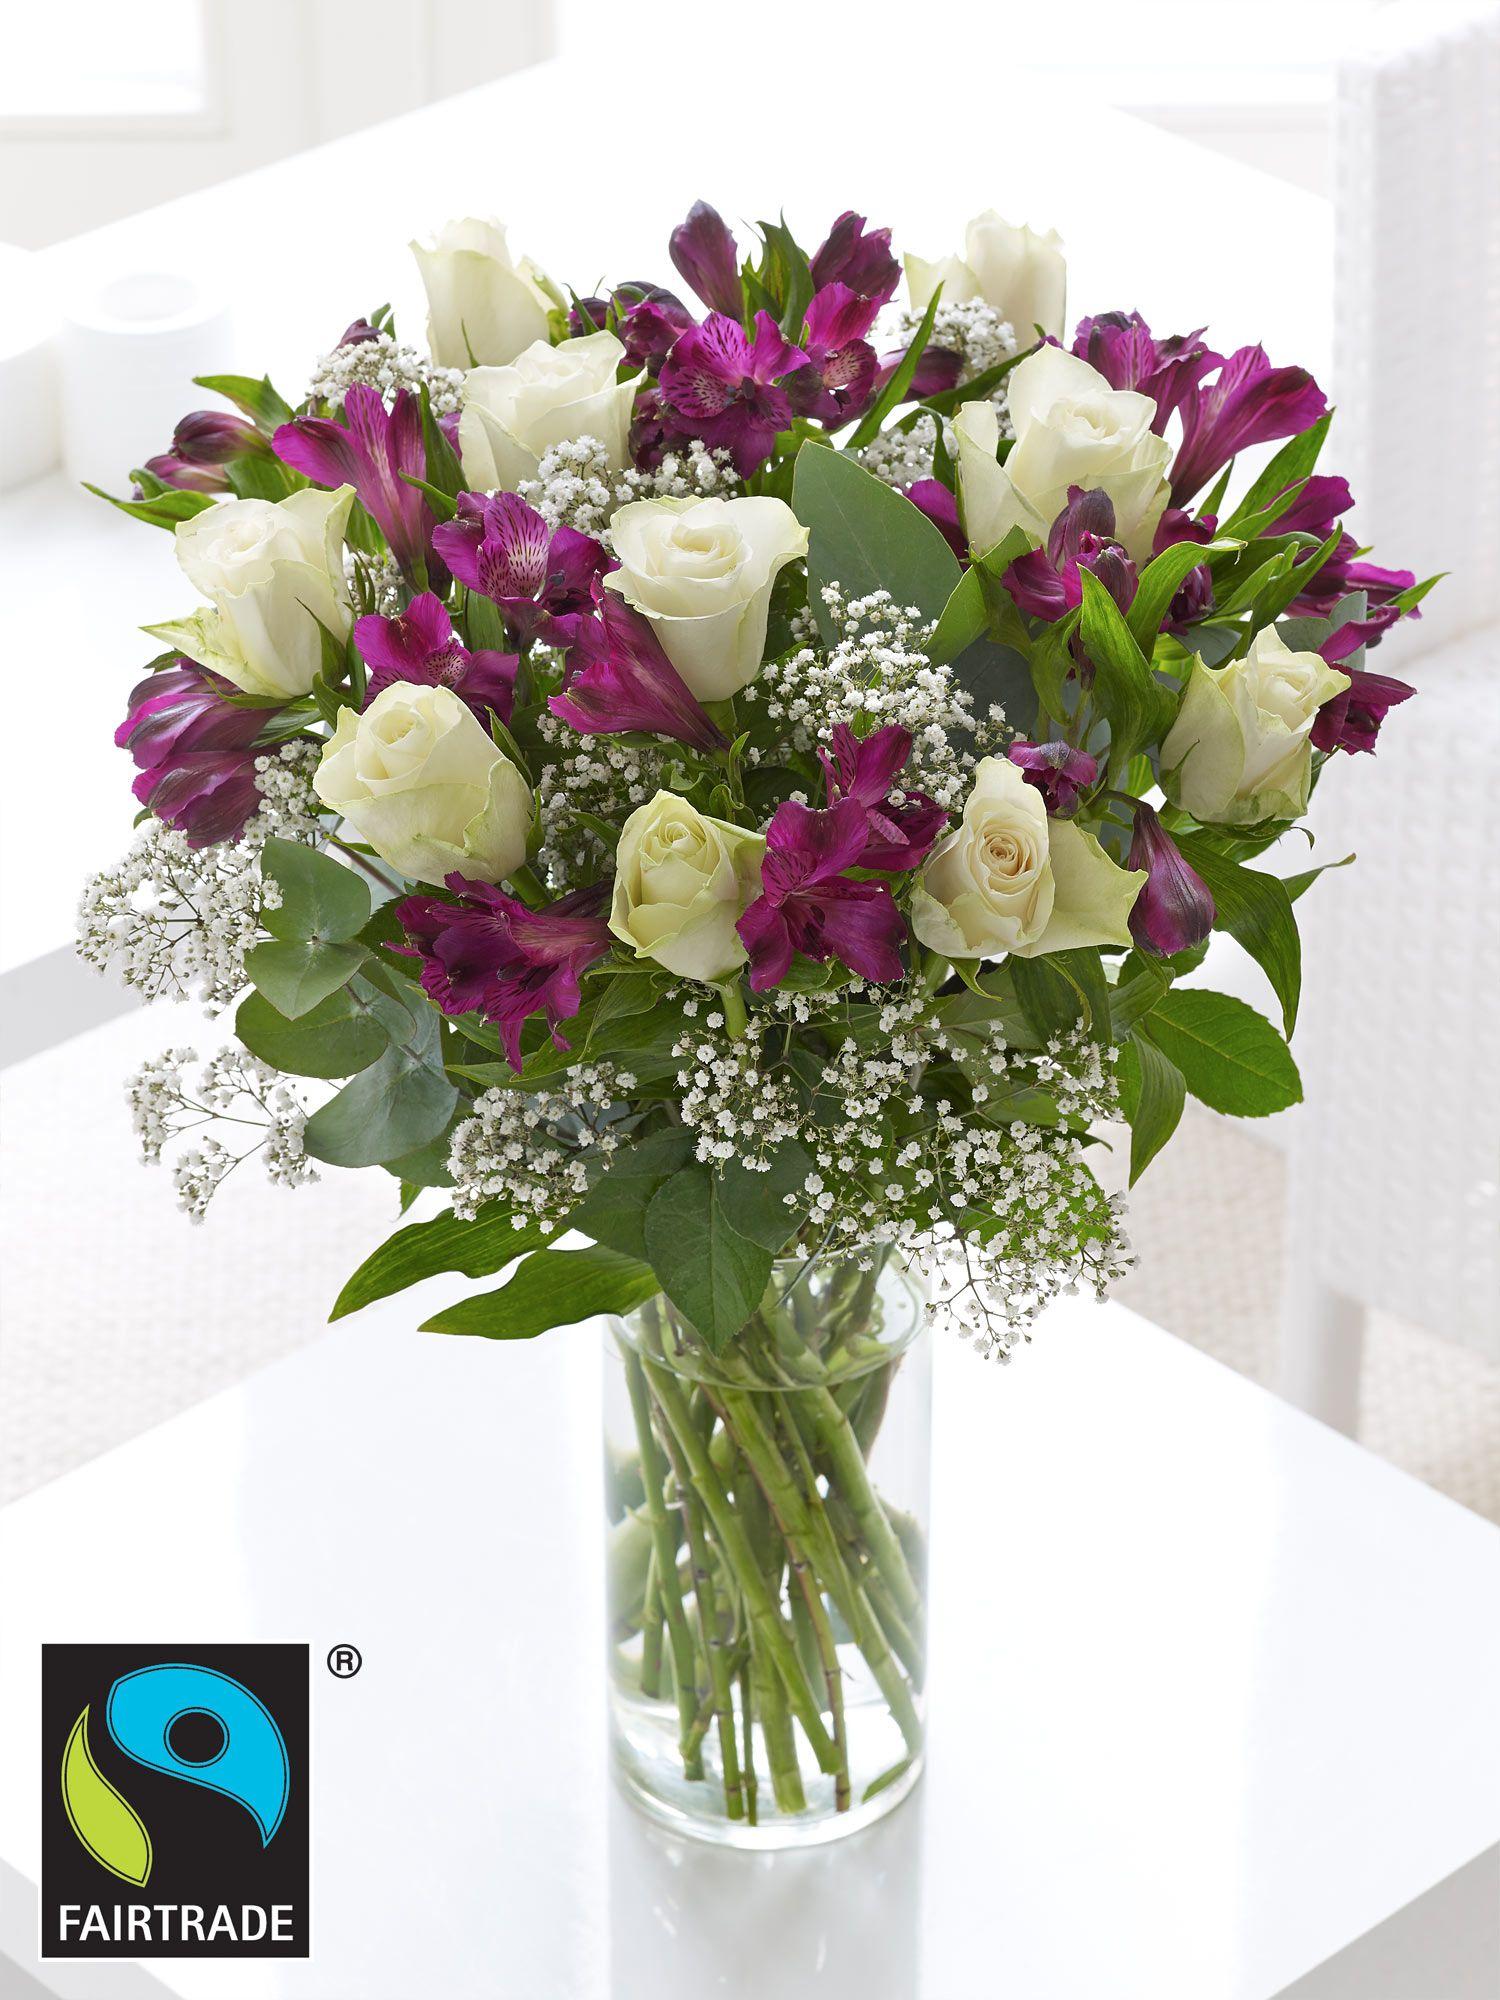 Interflora Fairtrade White Rose and Alstromeria Handtied